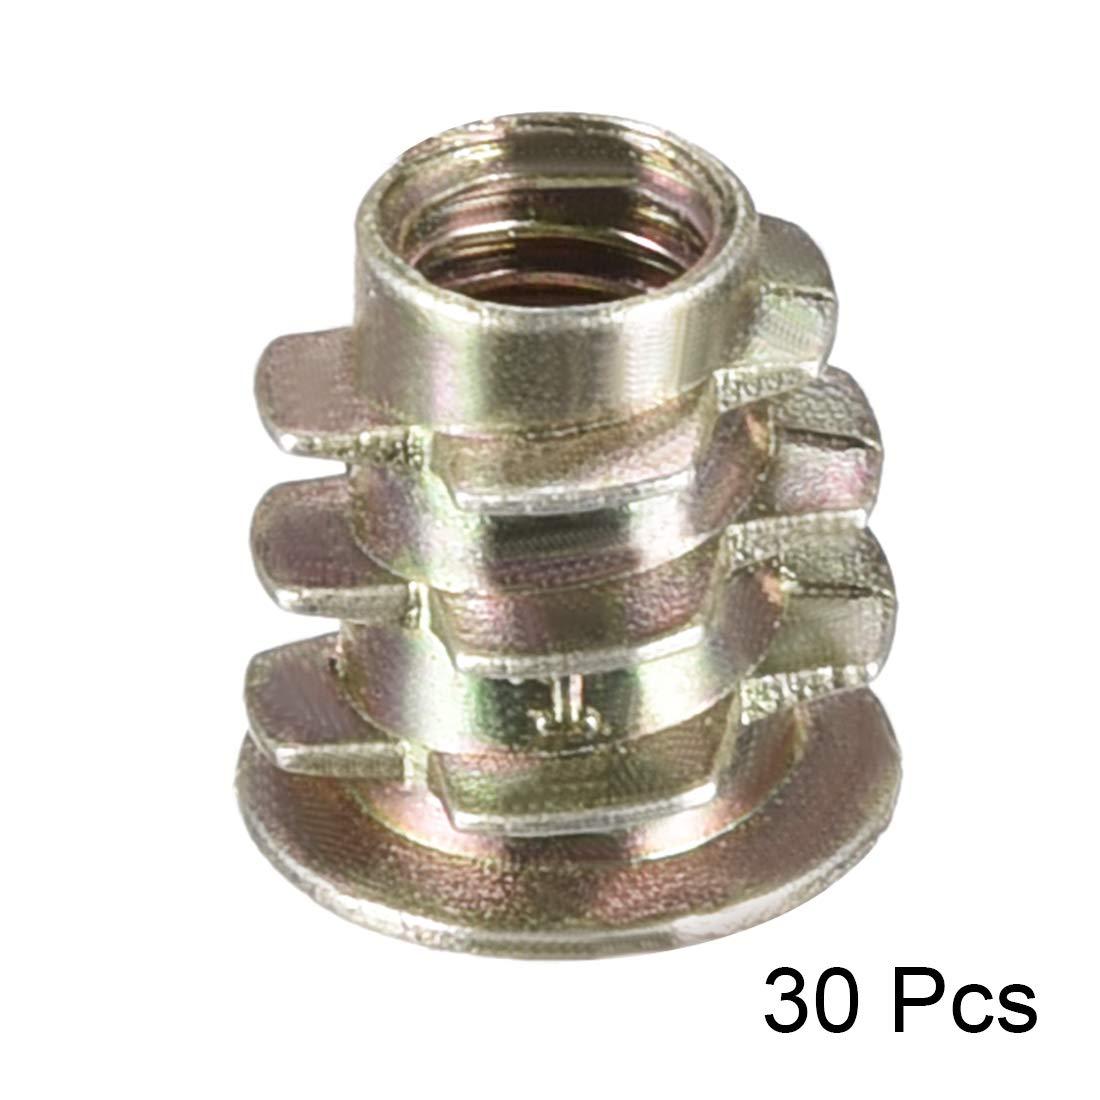 uxcell Threaded Insert Nuts Zinc Alloy Hex Socket M4 Internal Threads 8mm Length 50pcs a18071100ux0194